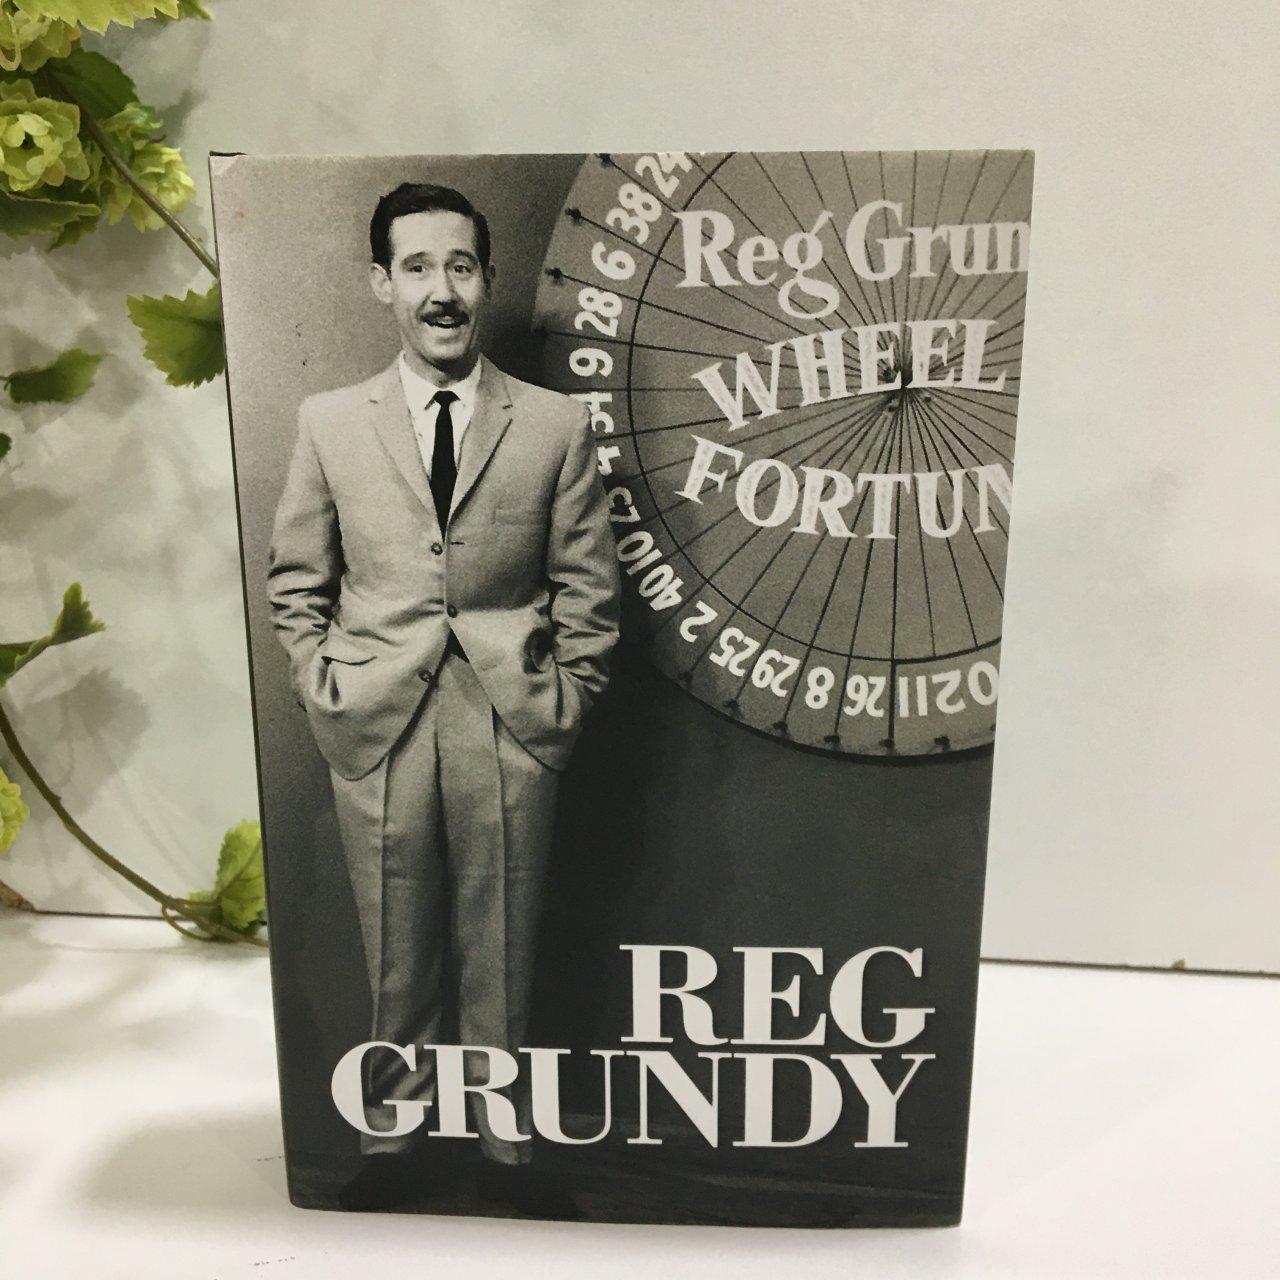 50% Off - Reg Grundy, Reg Grundy's Wheel of Fortune